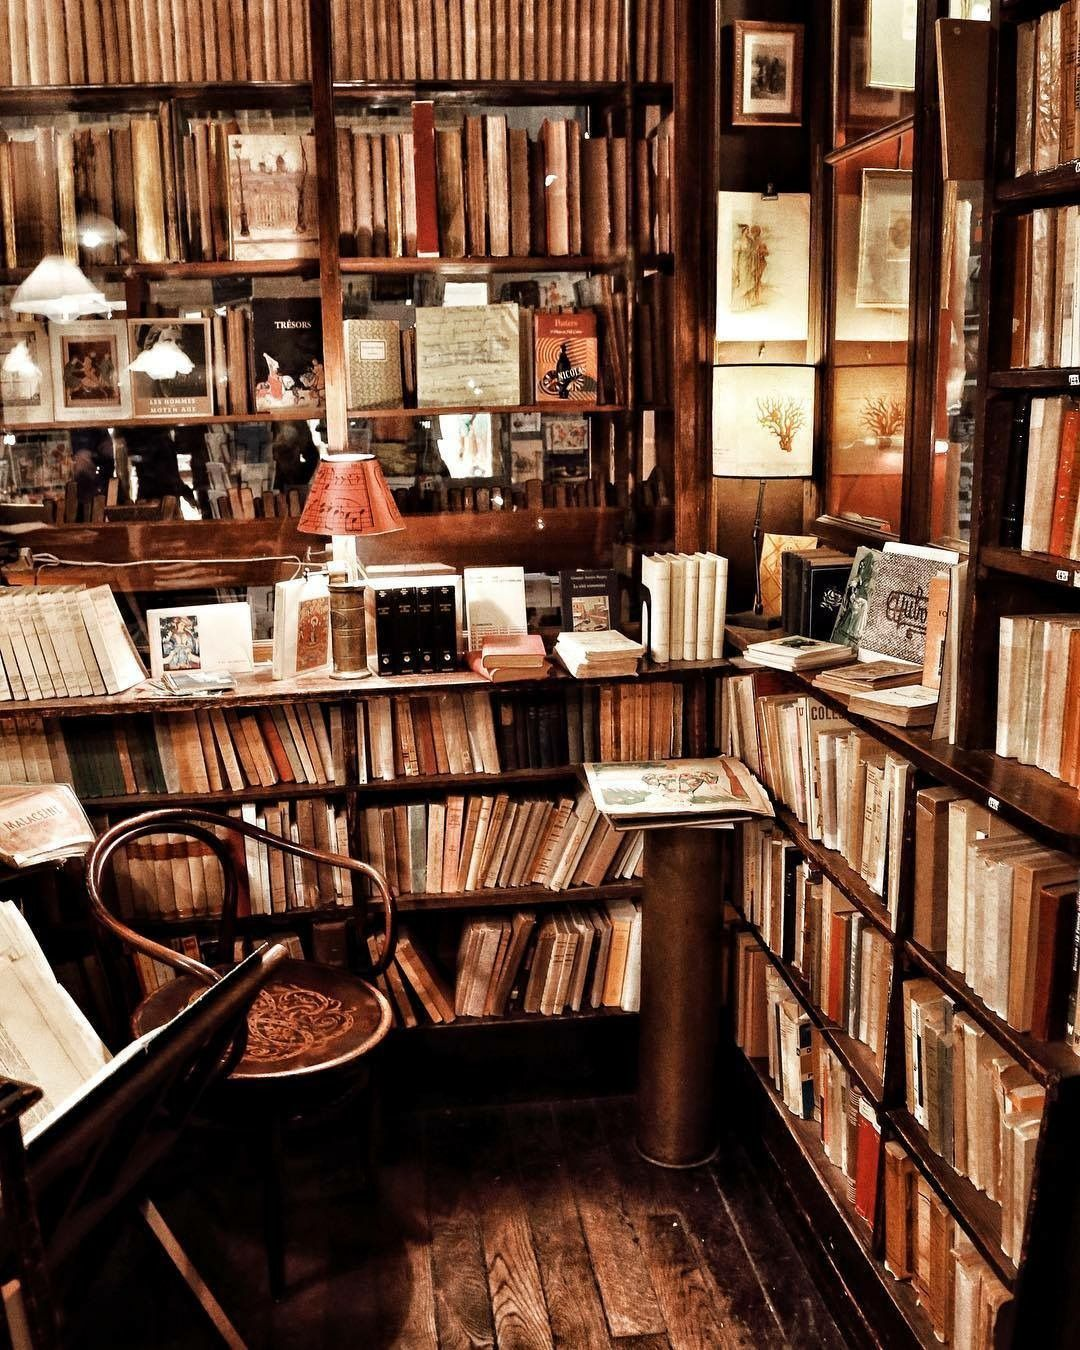 This Is Soo Gorgeous Bibliotecas Caseras Biblioteca Casera